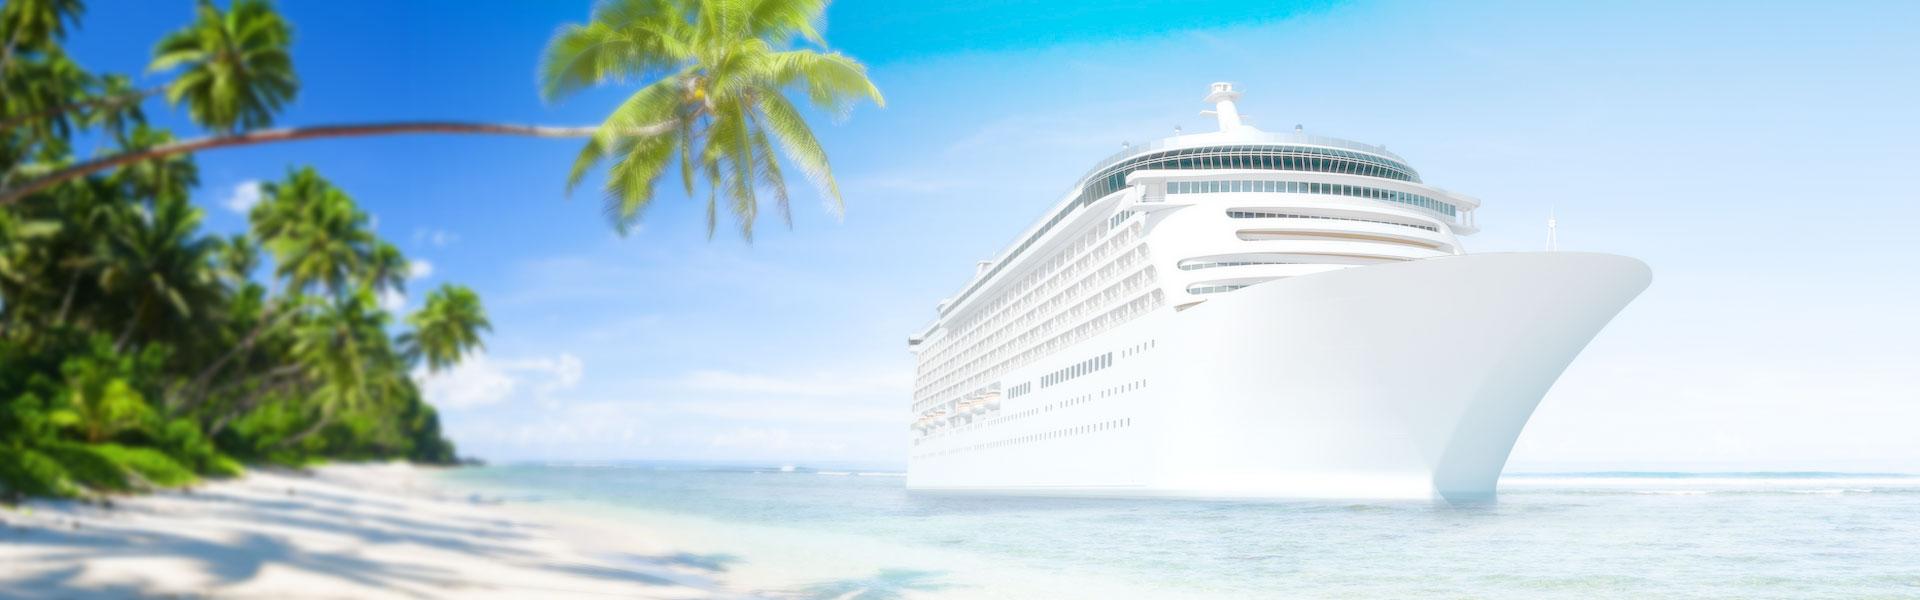 cruise-ship-slider